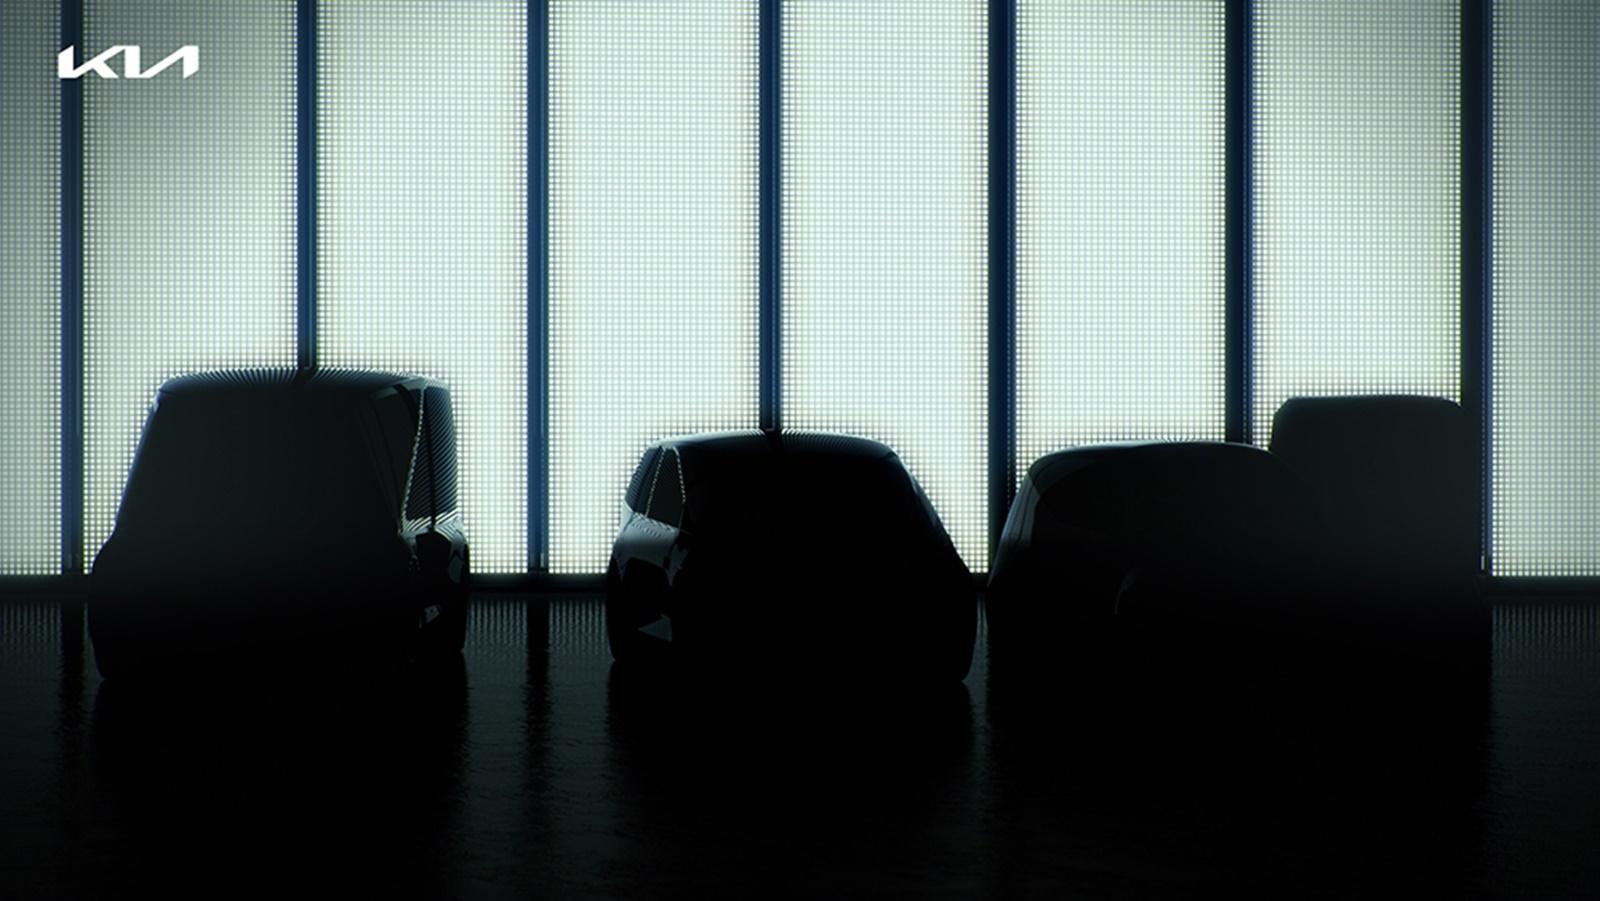 Kia Presents Its New Brand Purpose And Future Strategy 2